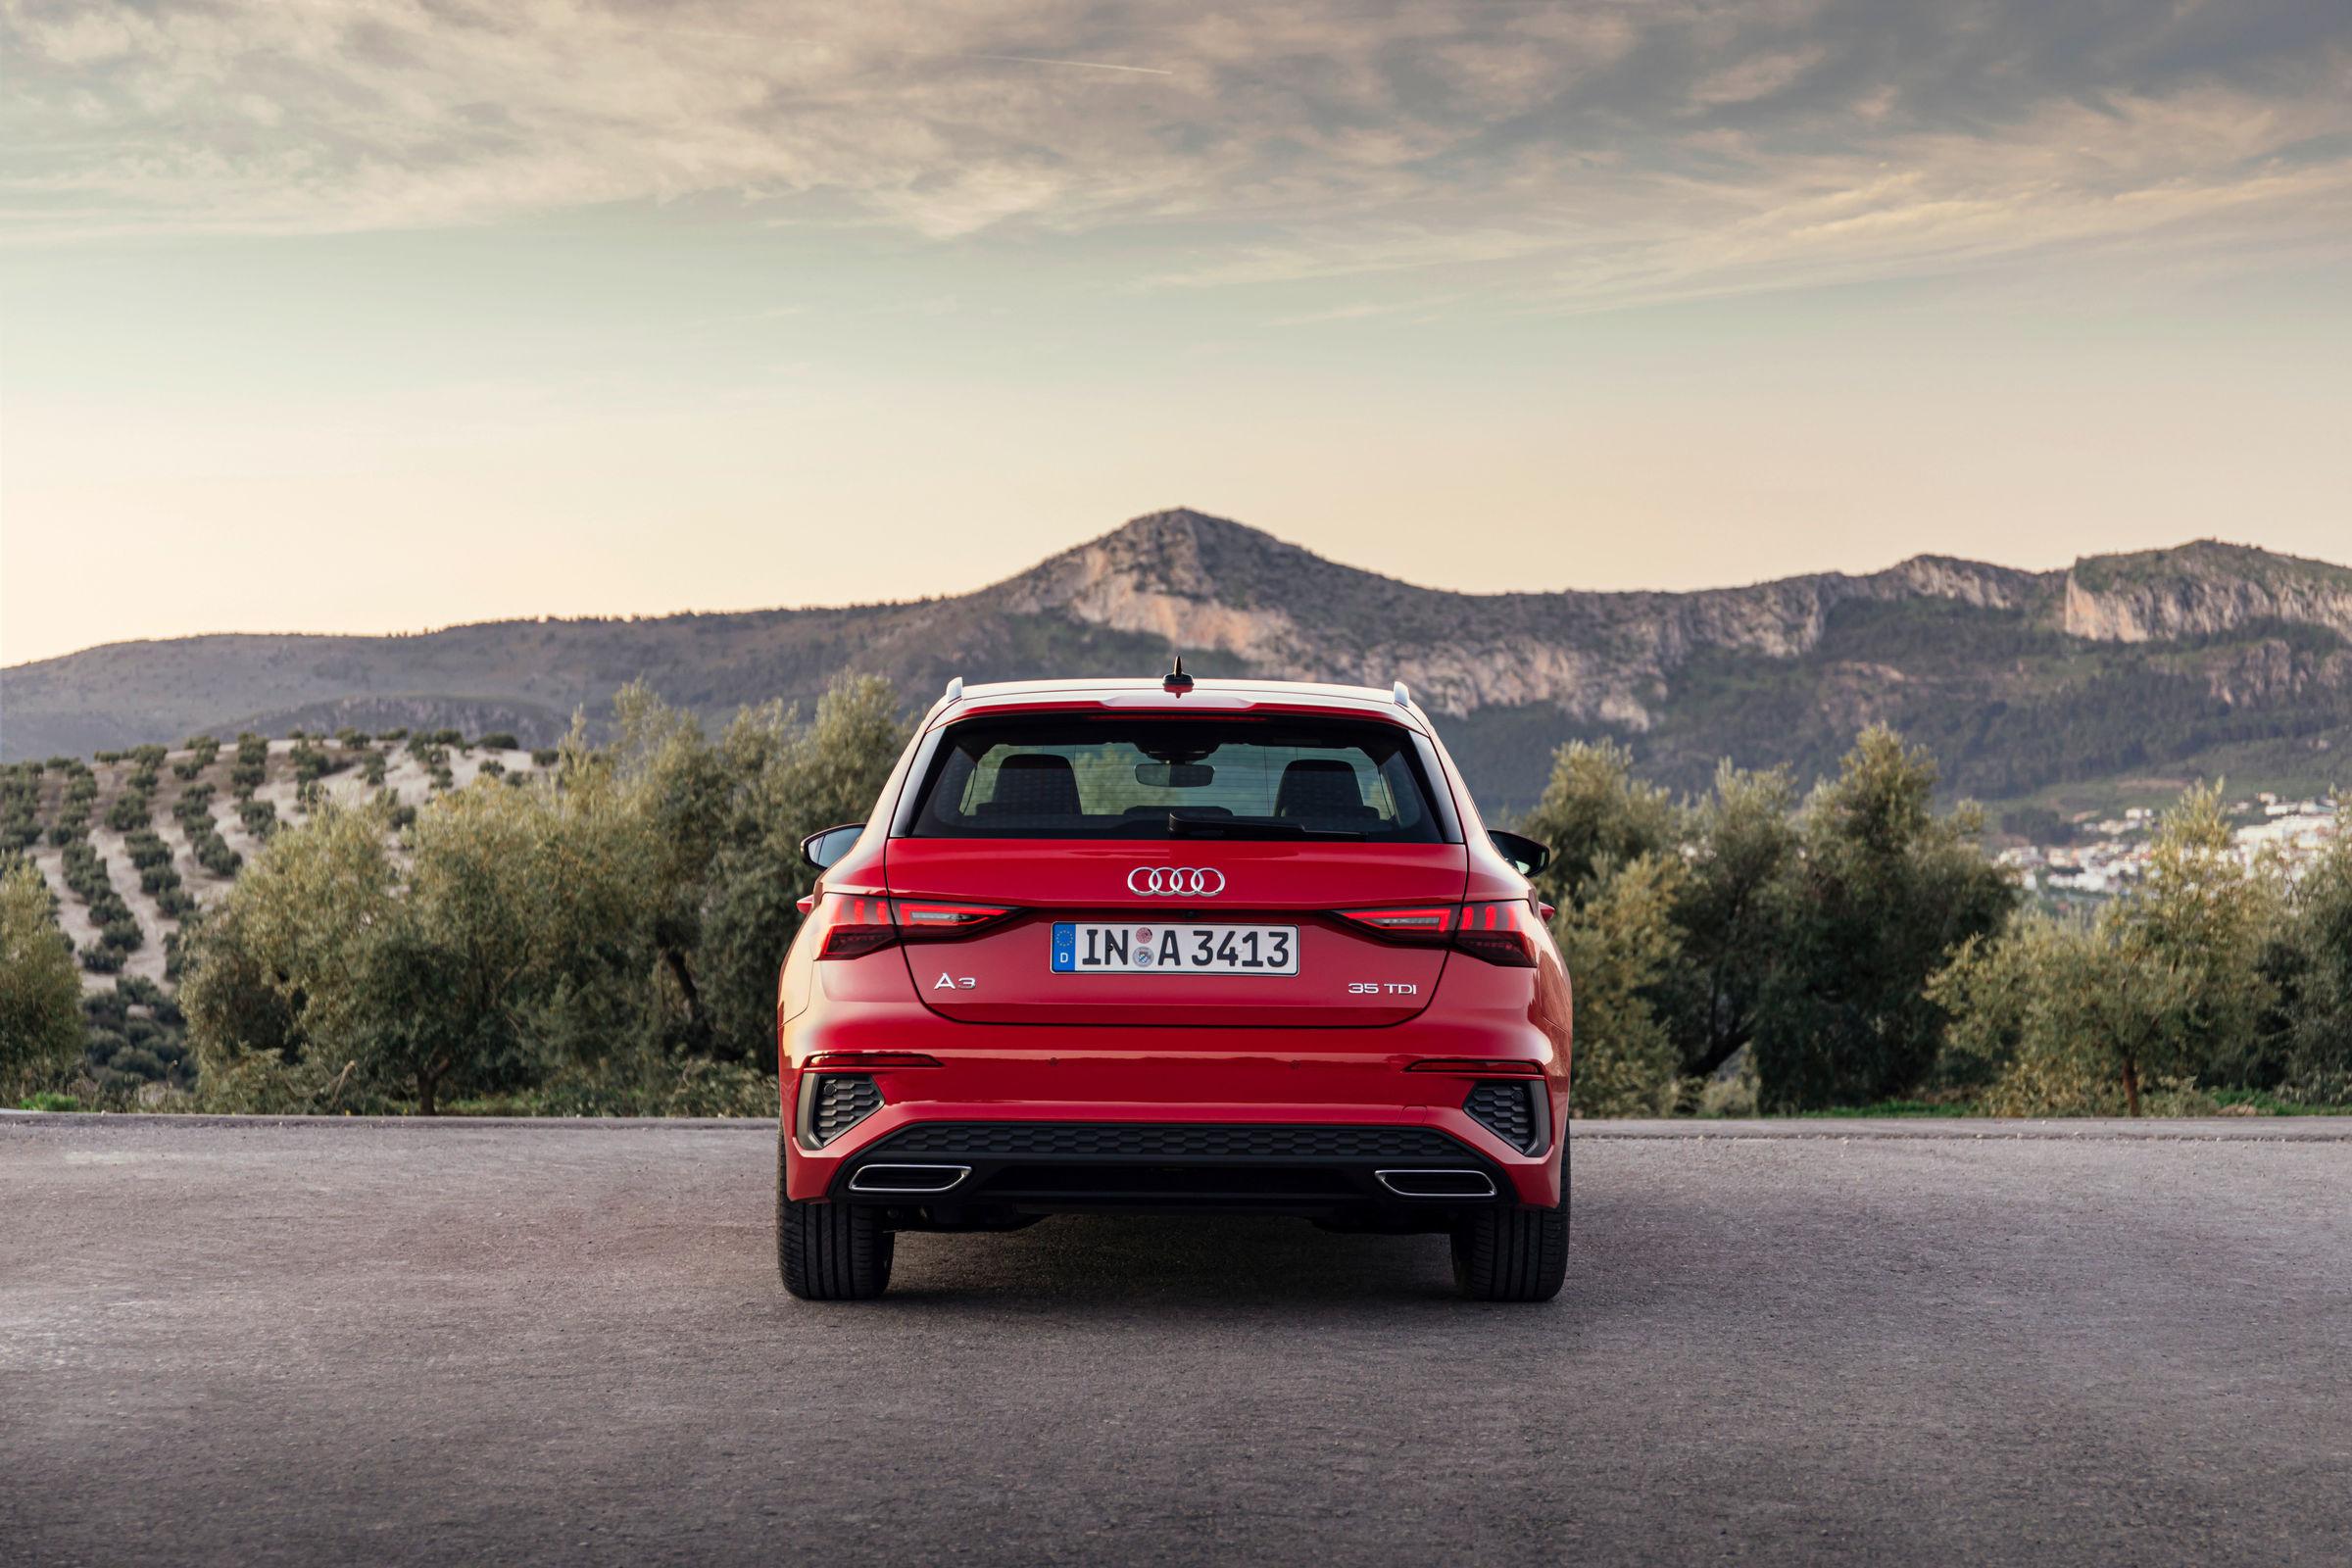 Success model 4.0: the new Audi A3 Sportback - Image 4